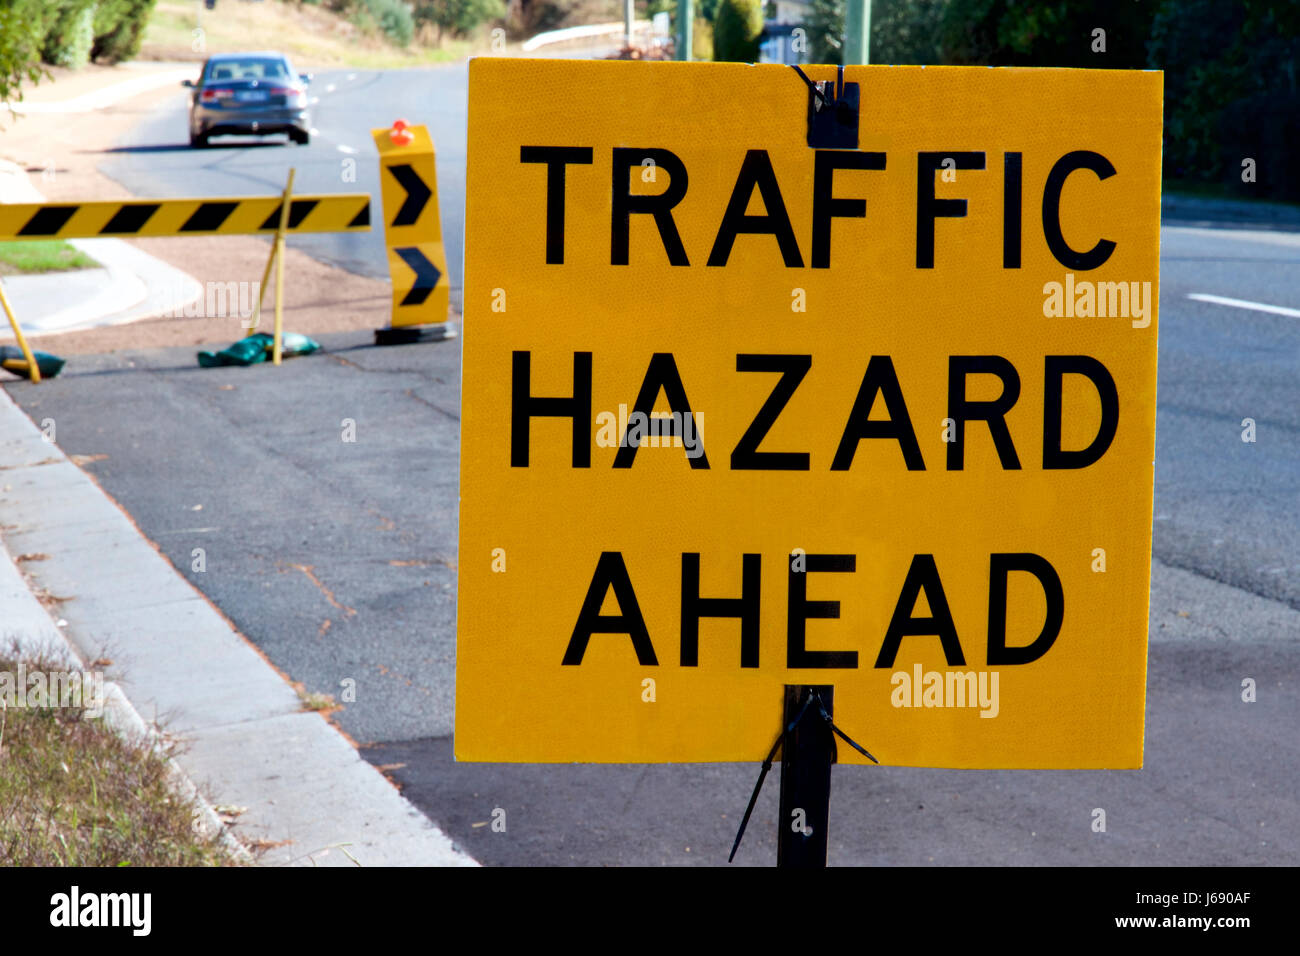 Traffic hazard ahead sign. - Stock Image